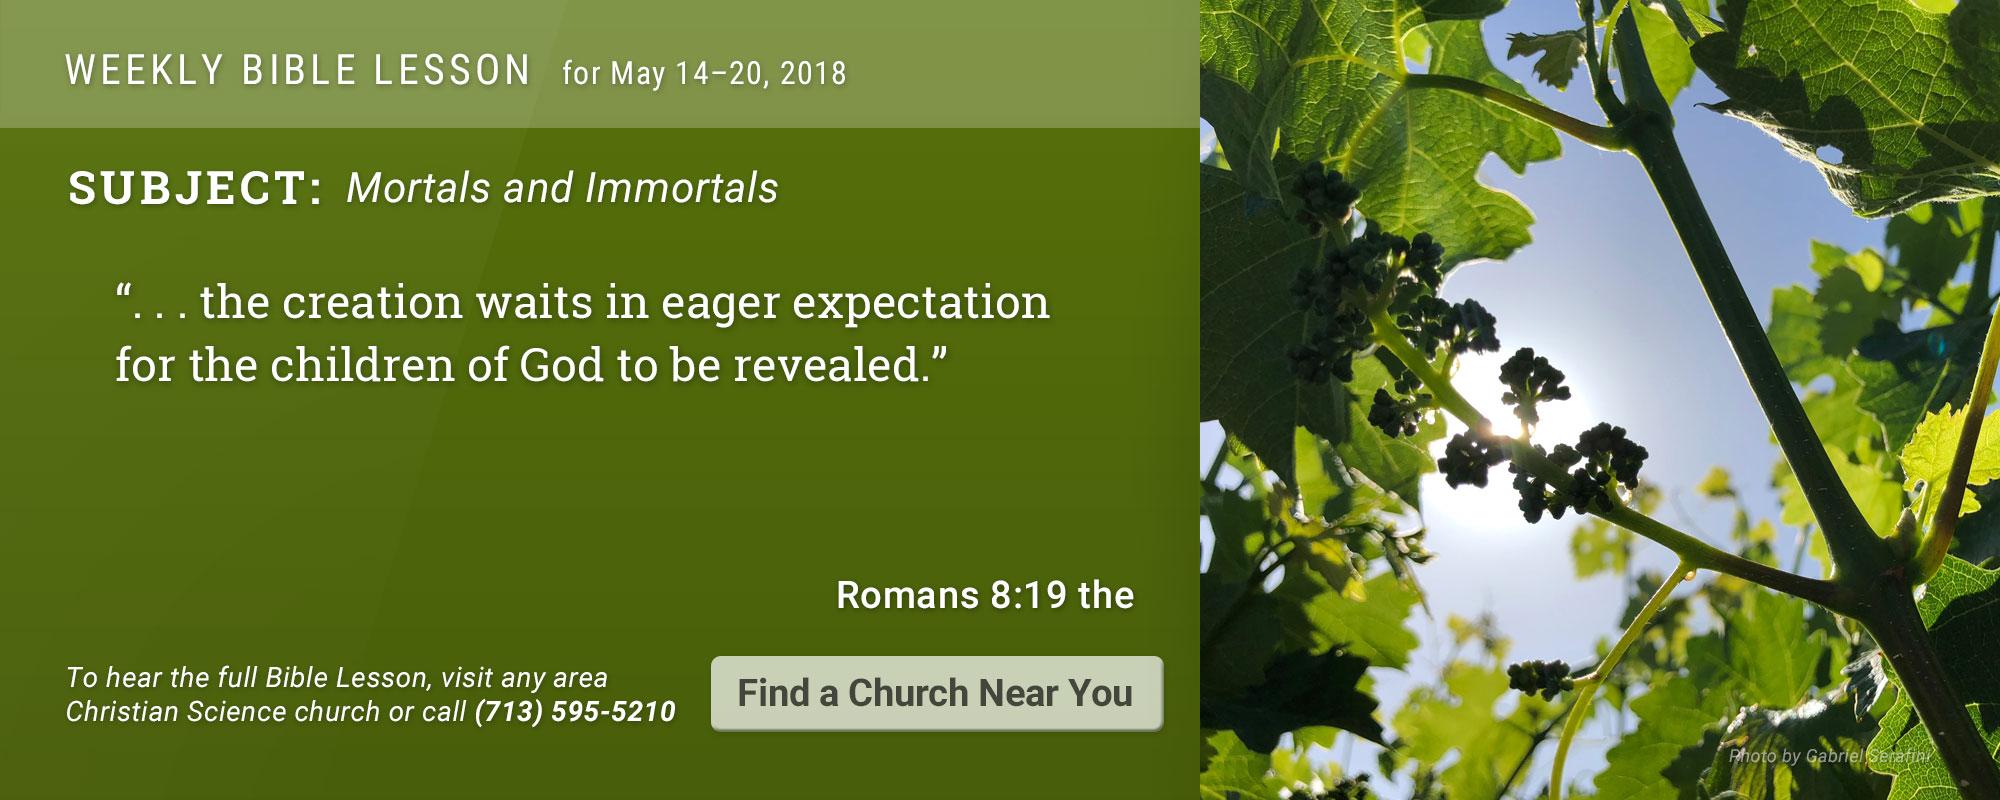 Bible Lesson Golden Text 20171211